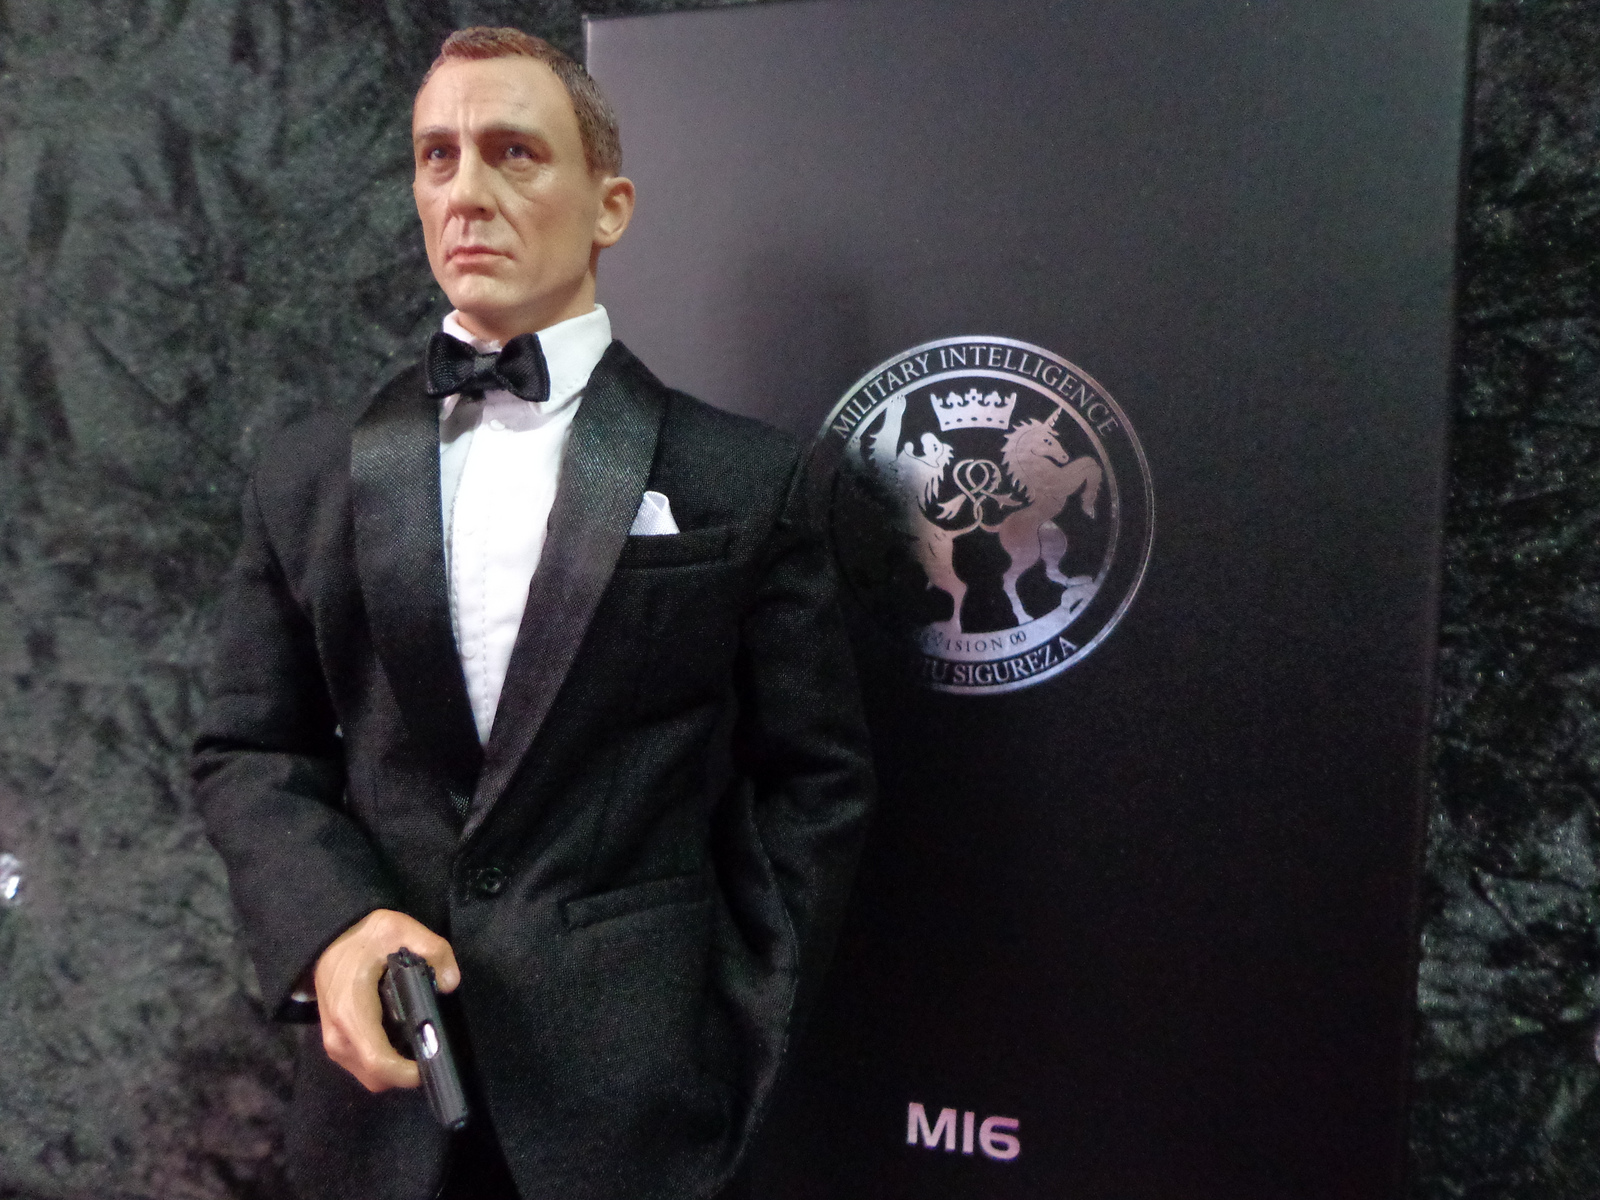 1/6 figure of Daniel Craig as James Bond by imranbecks